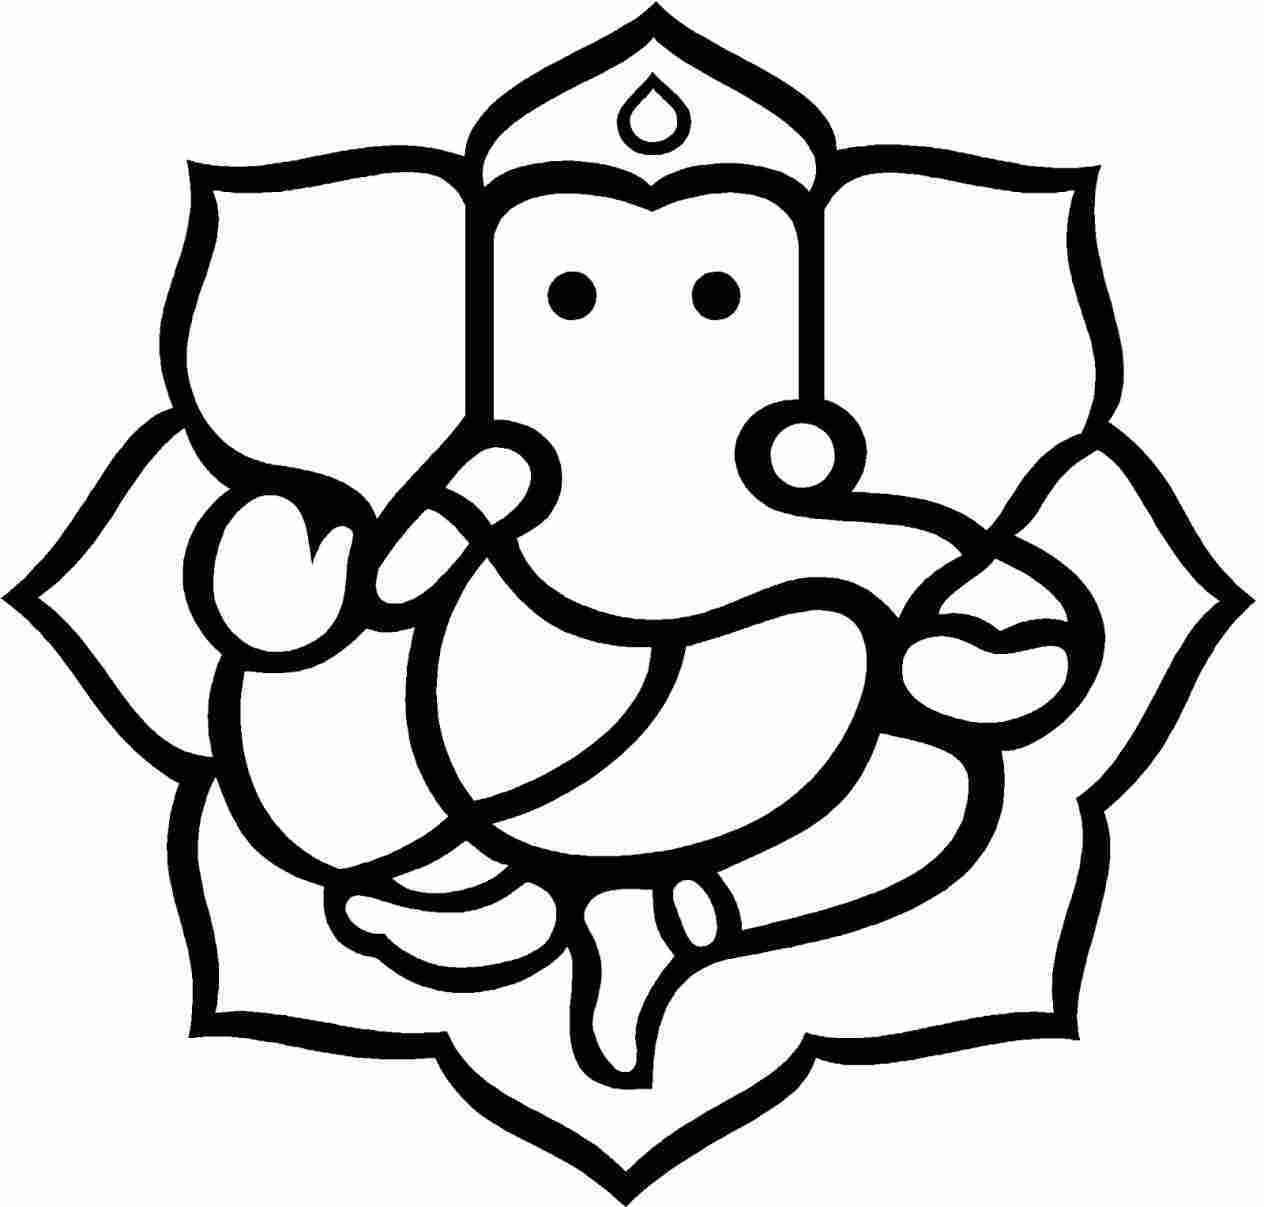 1264x1207 ganpati very easy drawing of ganesha sketches simple lord ganesh